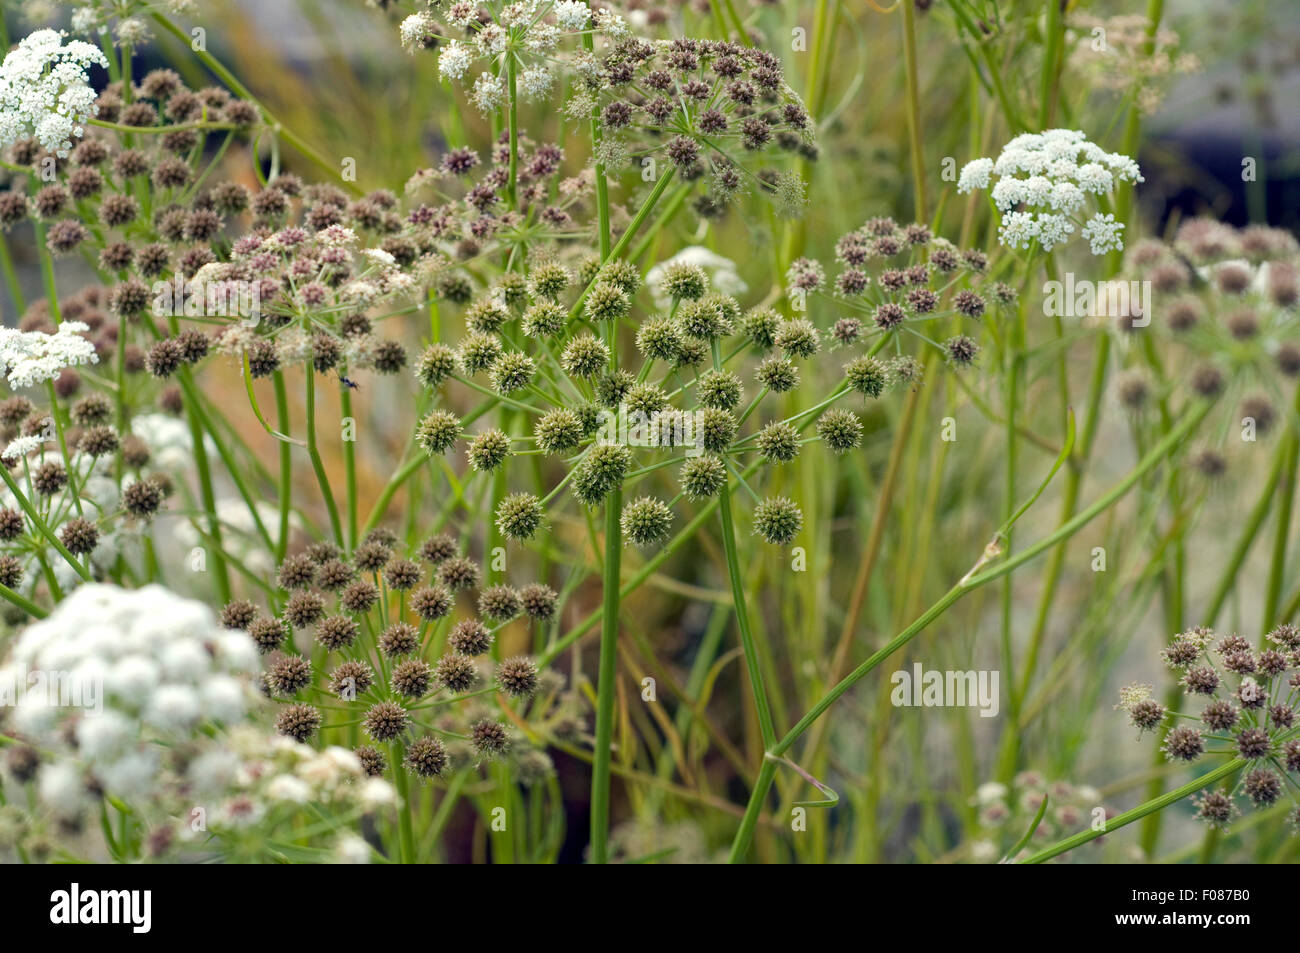 Meadow Wasserfenchel, Oenanthe, lachenalii, - Stock Image